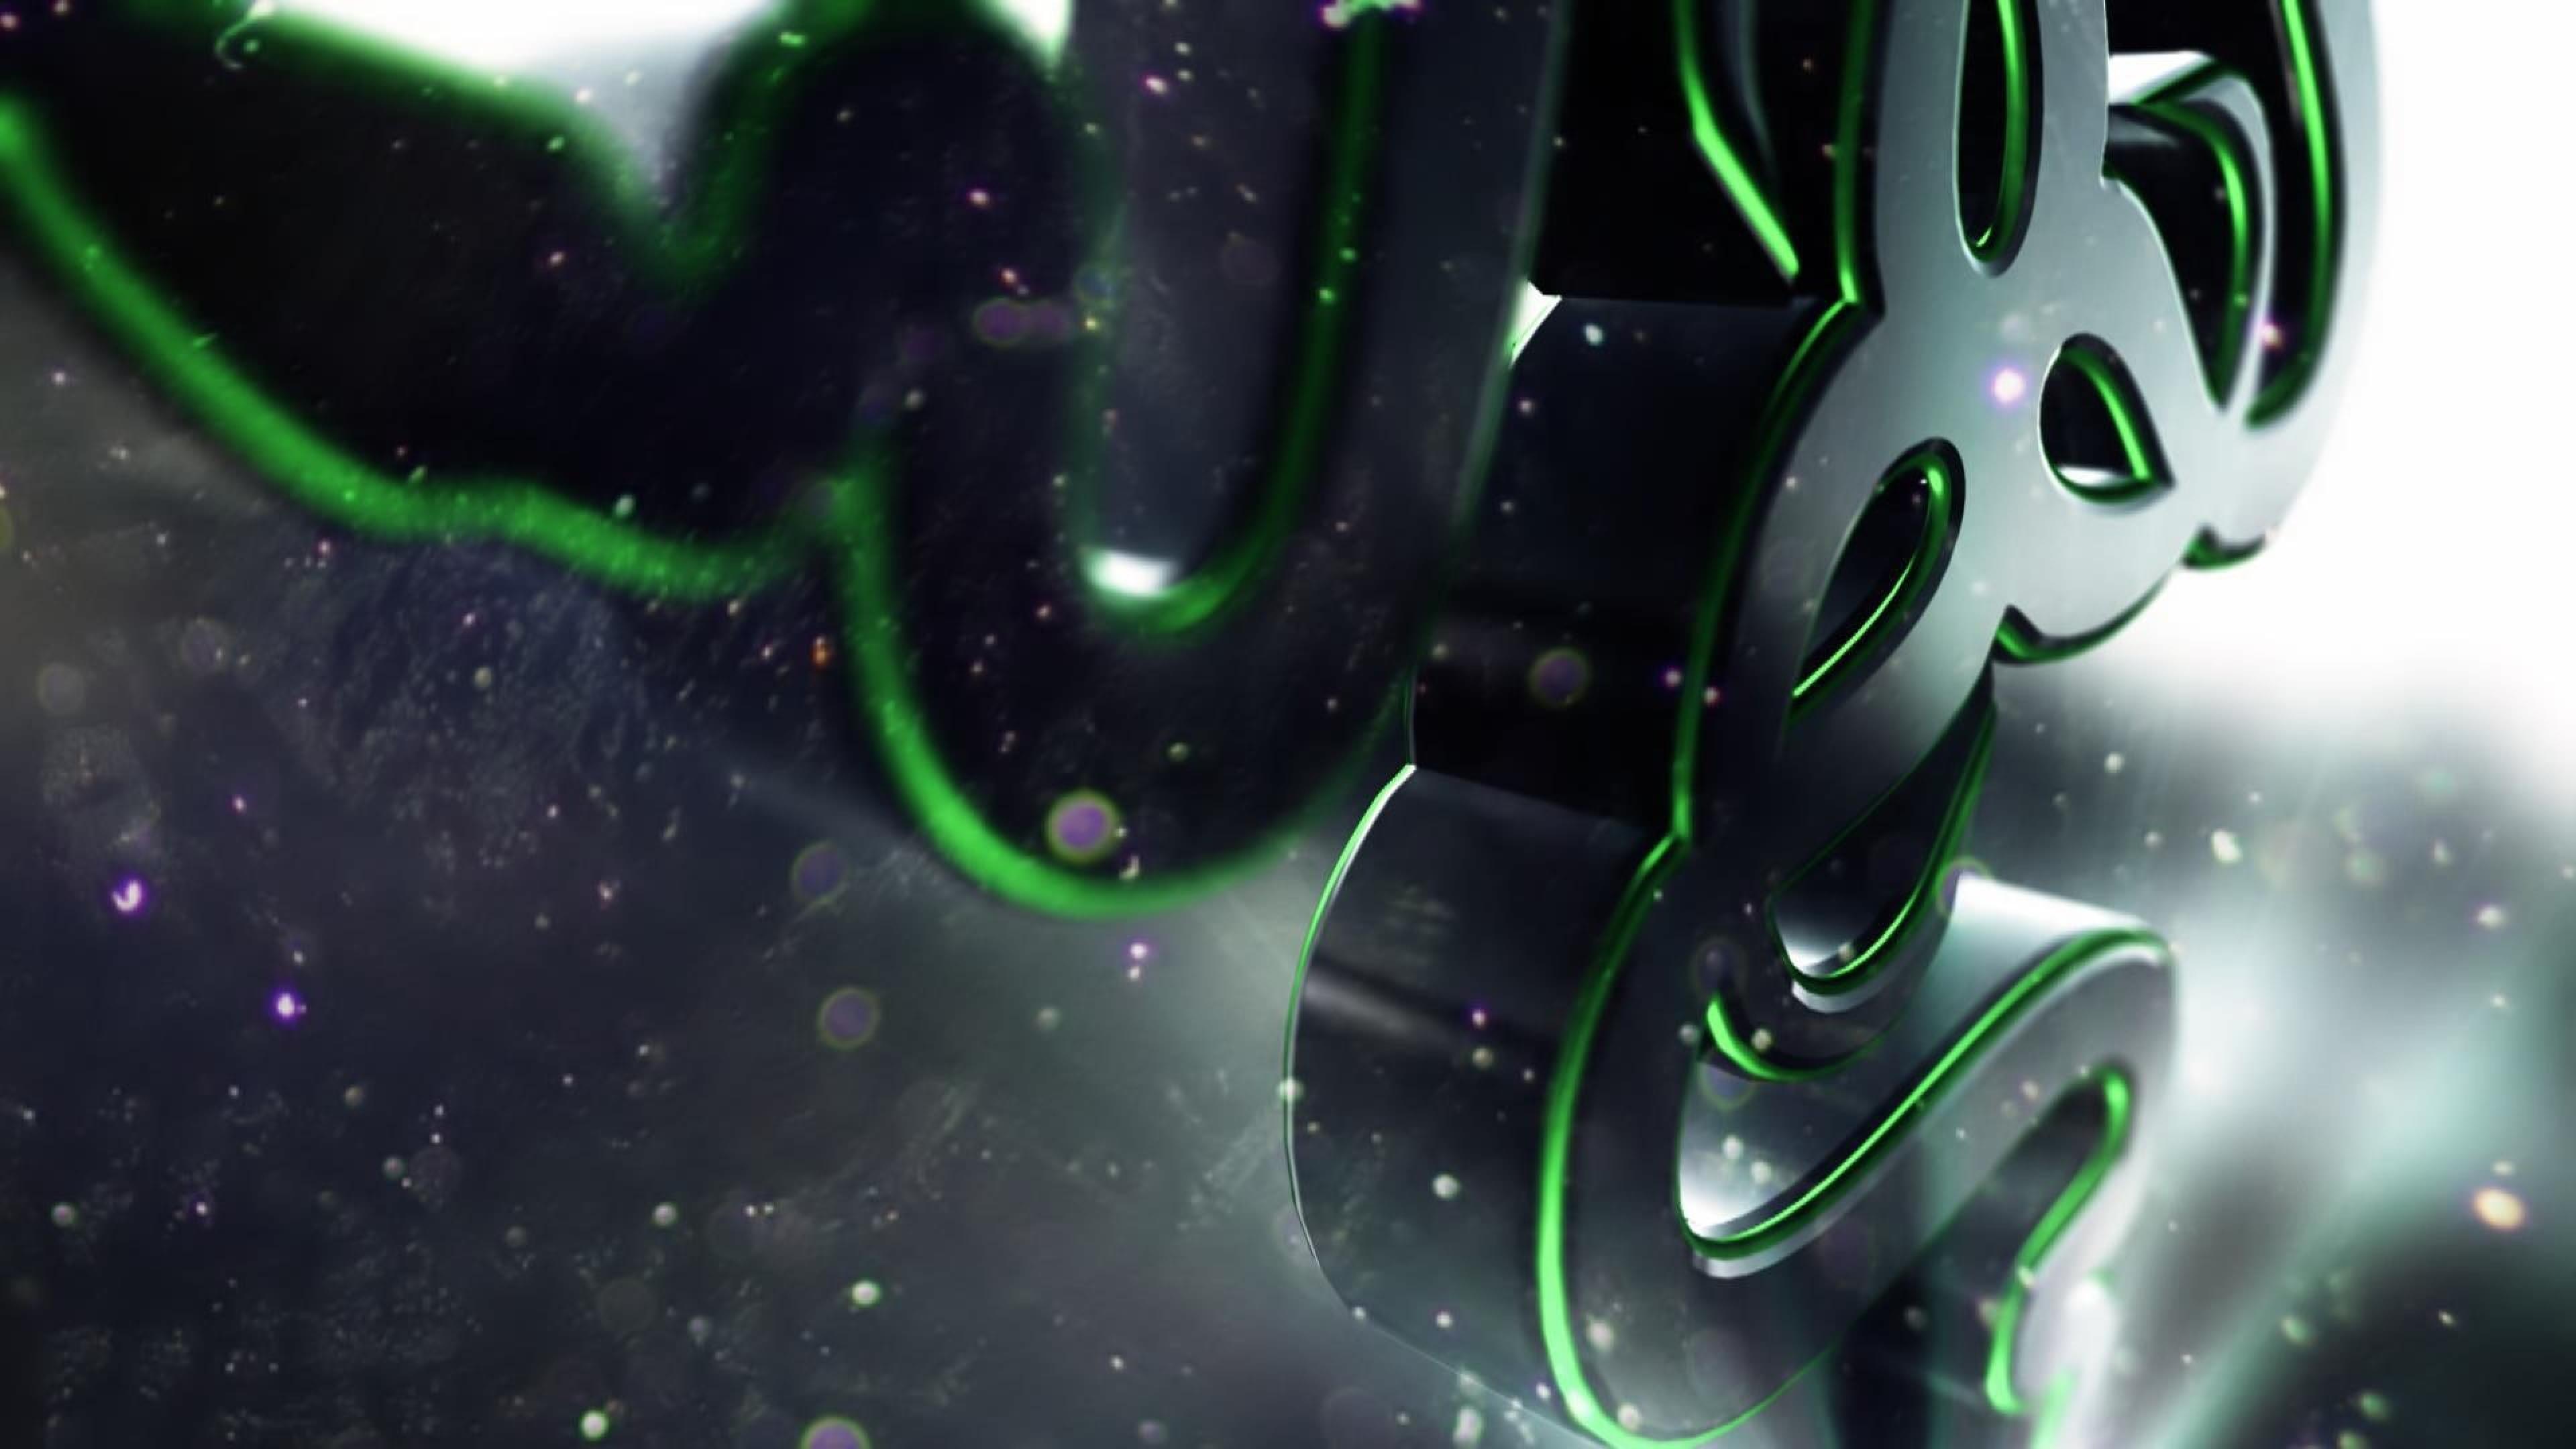 HD Background Razer 3D Logo Green Symbol Wallpaper Wallpapers Byte 3840x2160